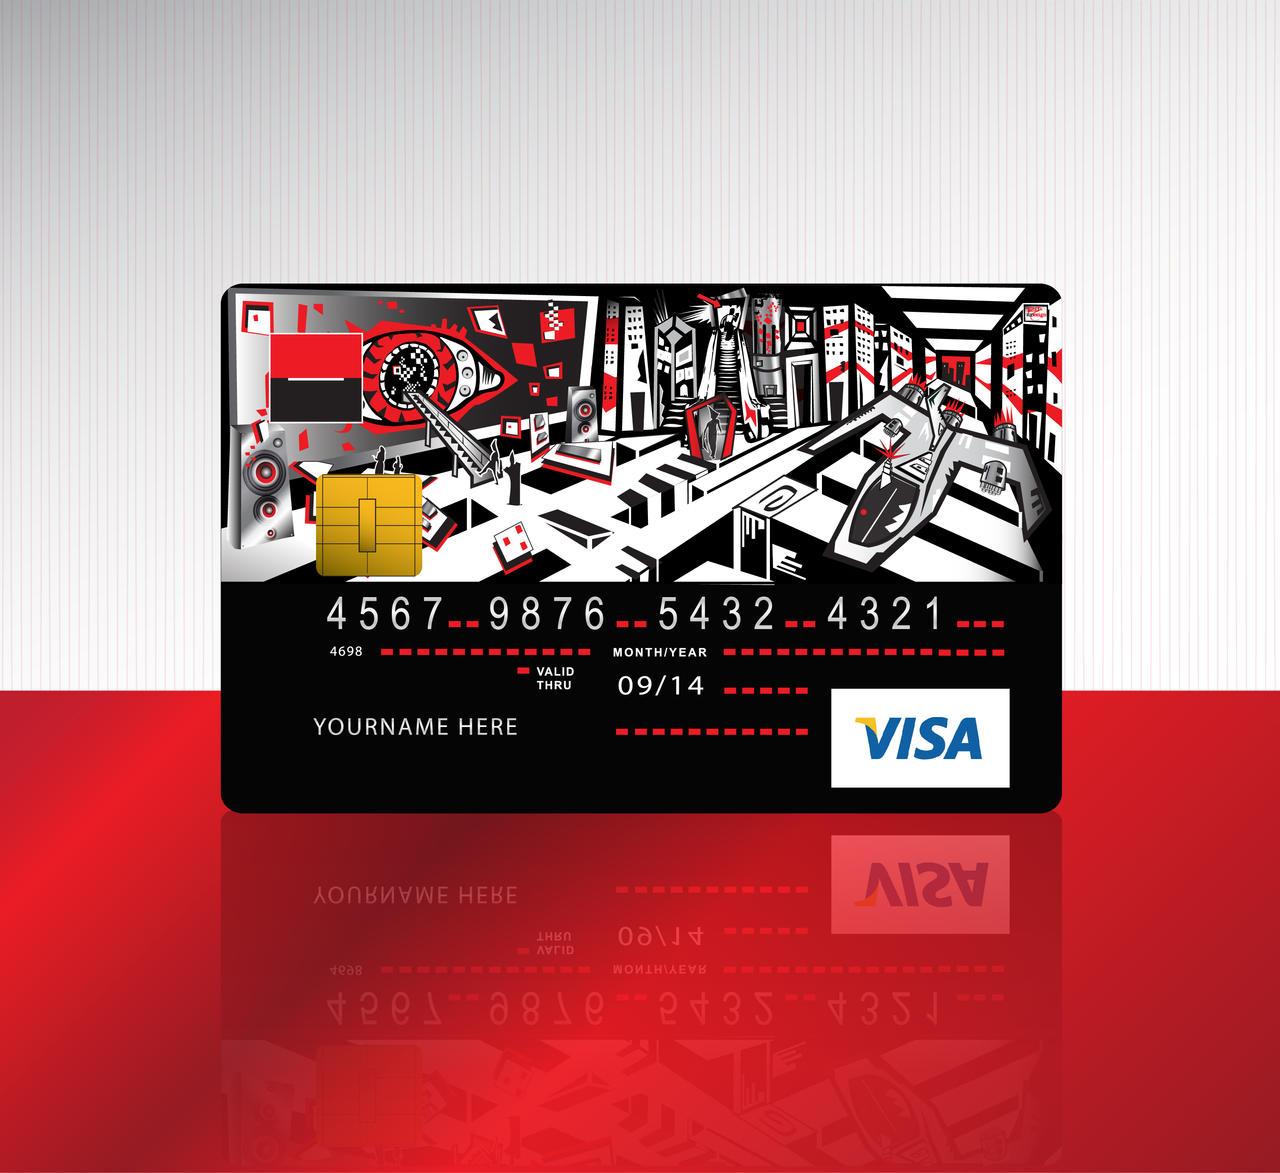 visa card designs hola klonec co